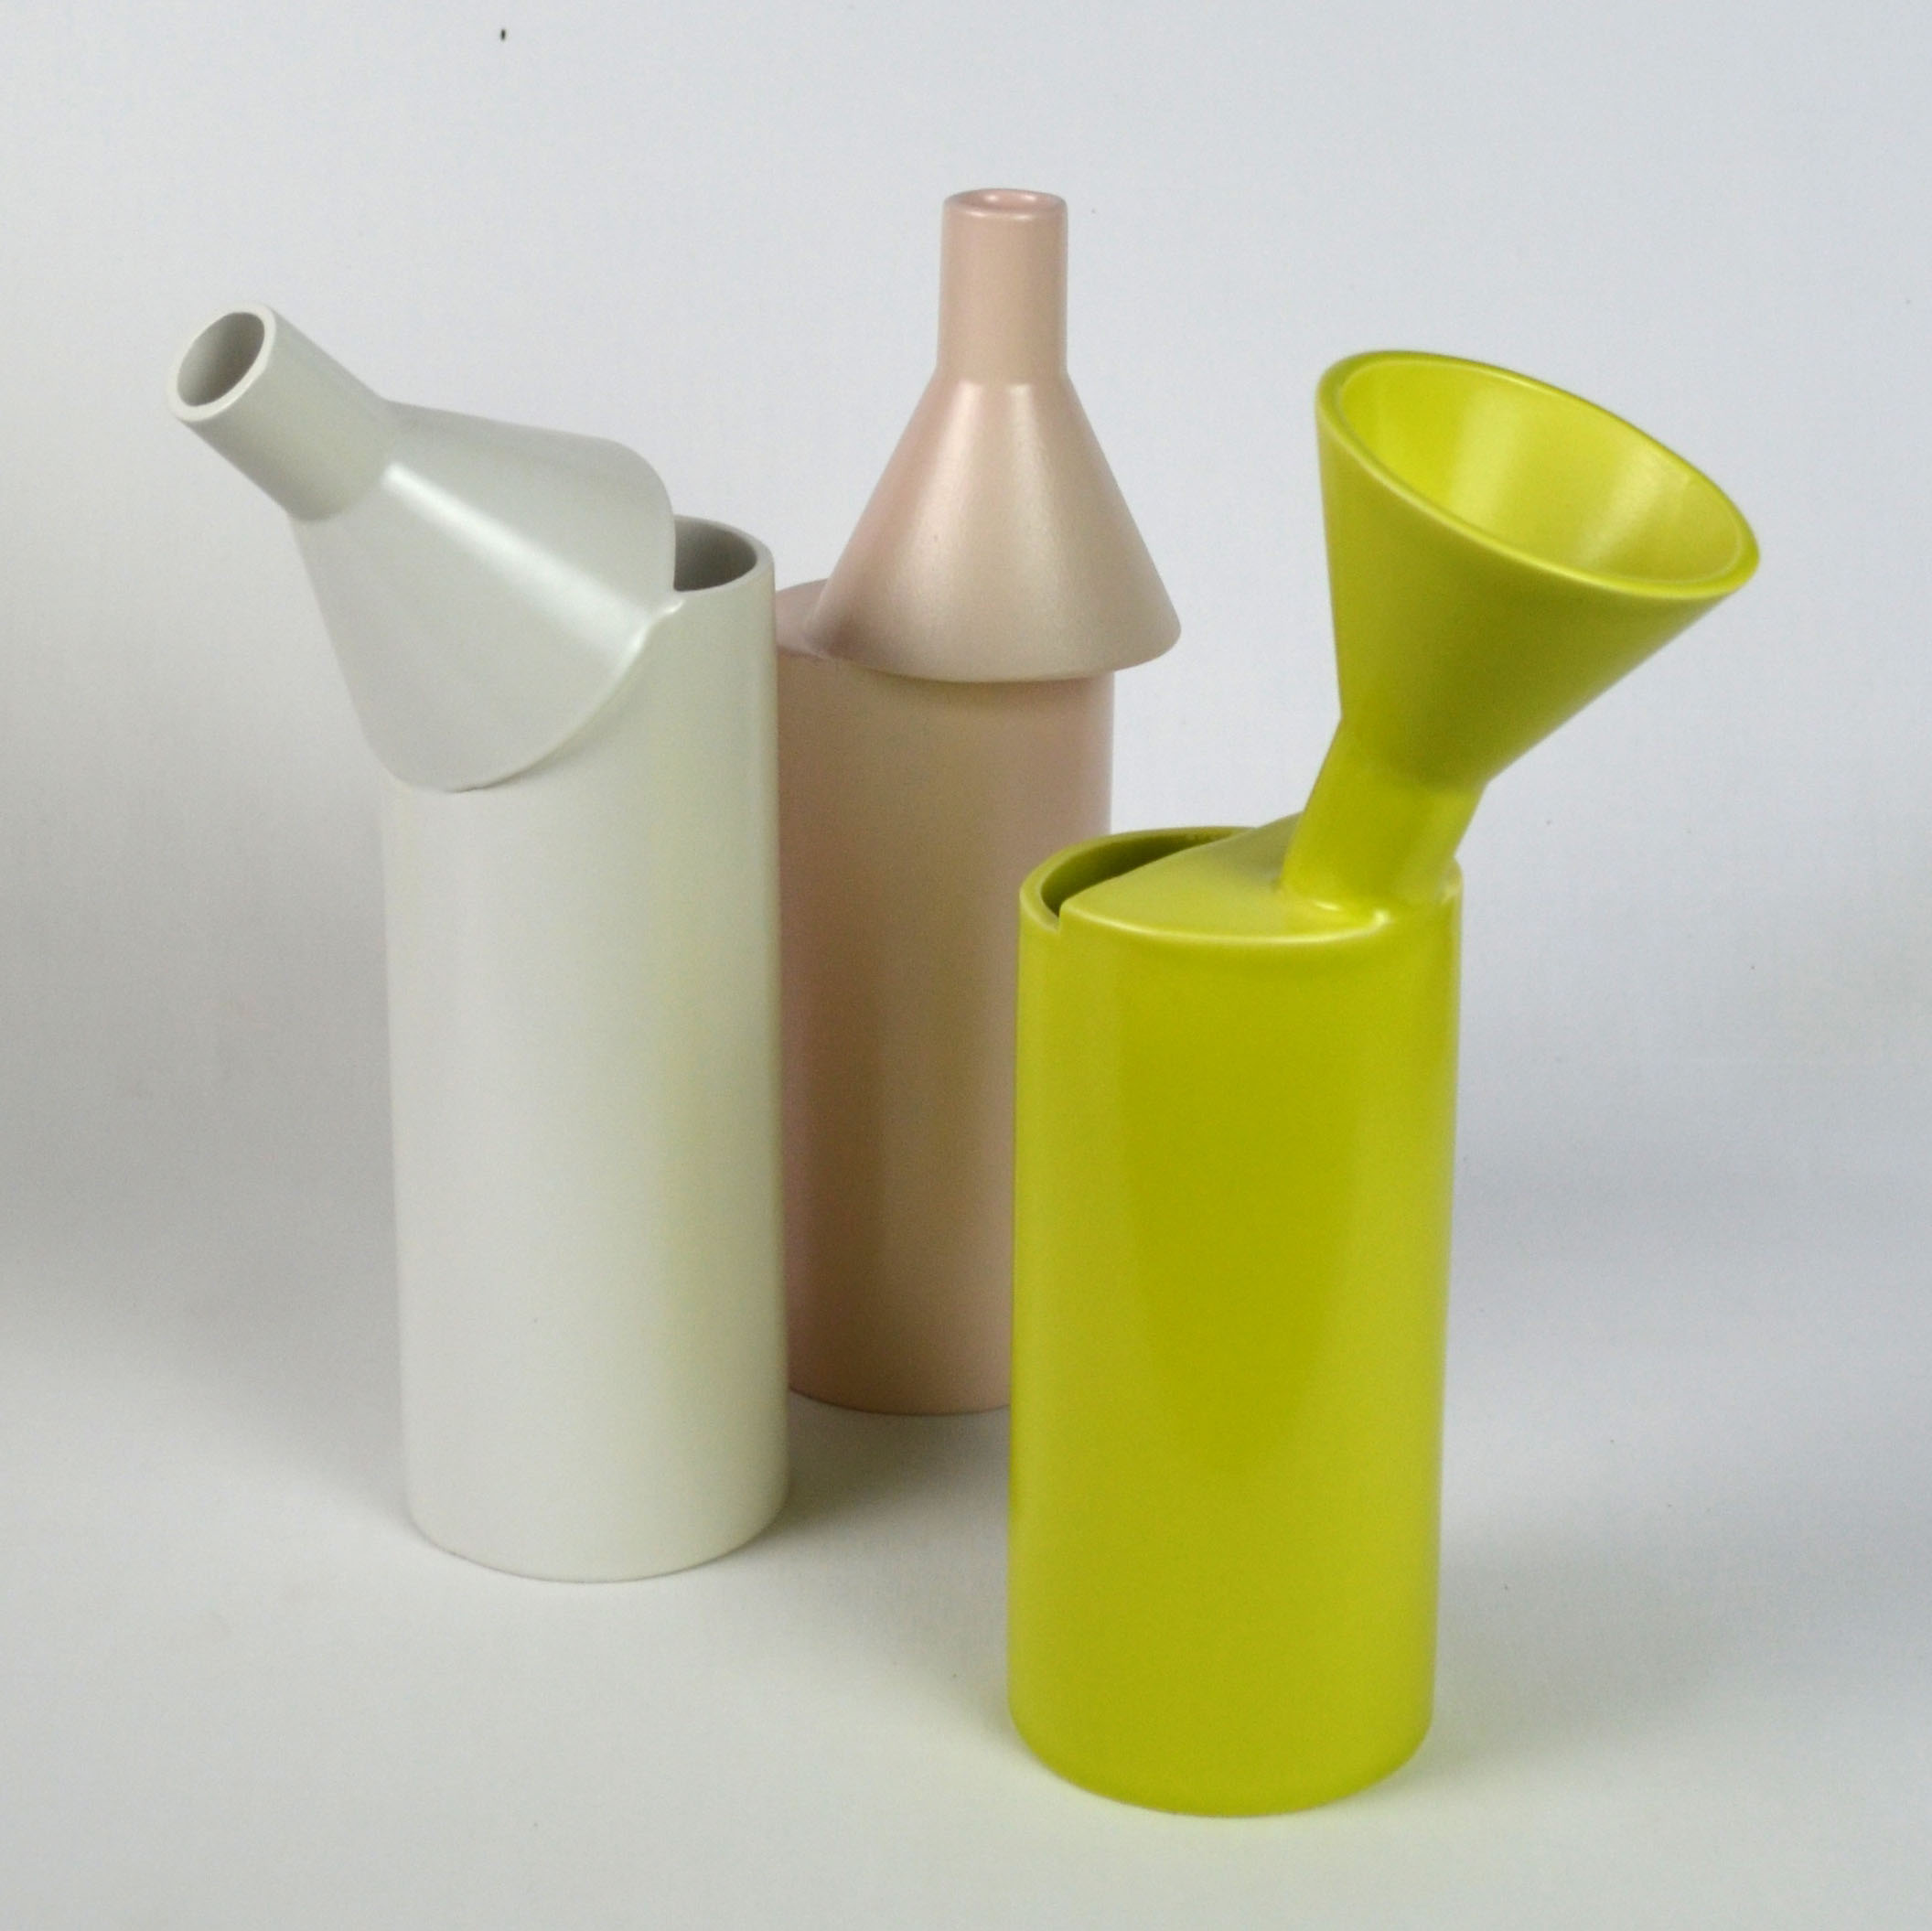 carafe-design-contemporain-céramique